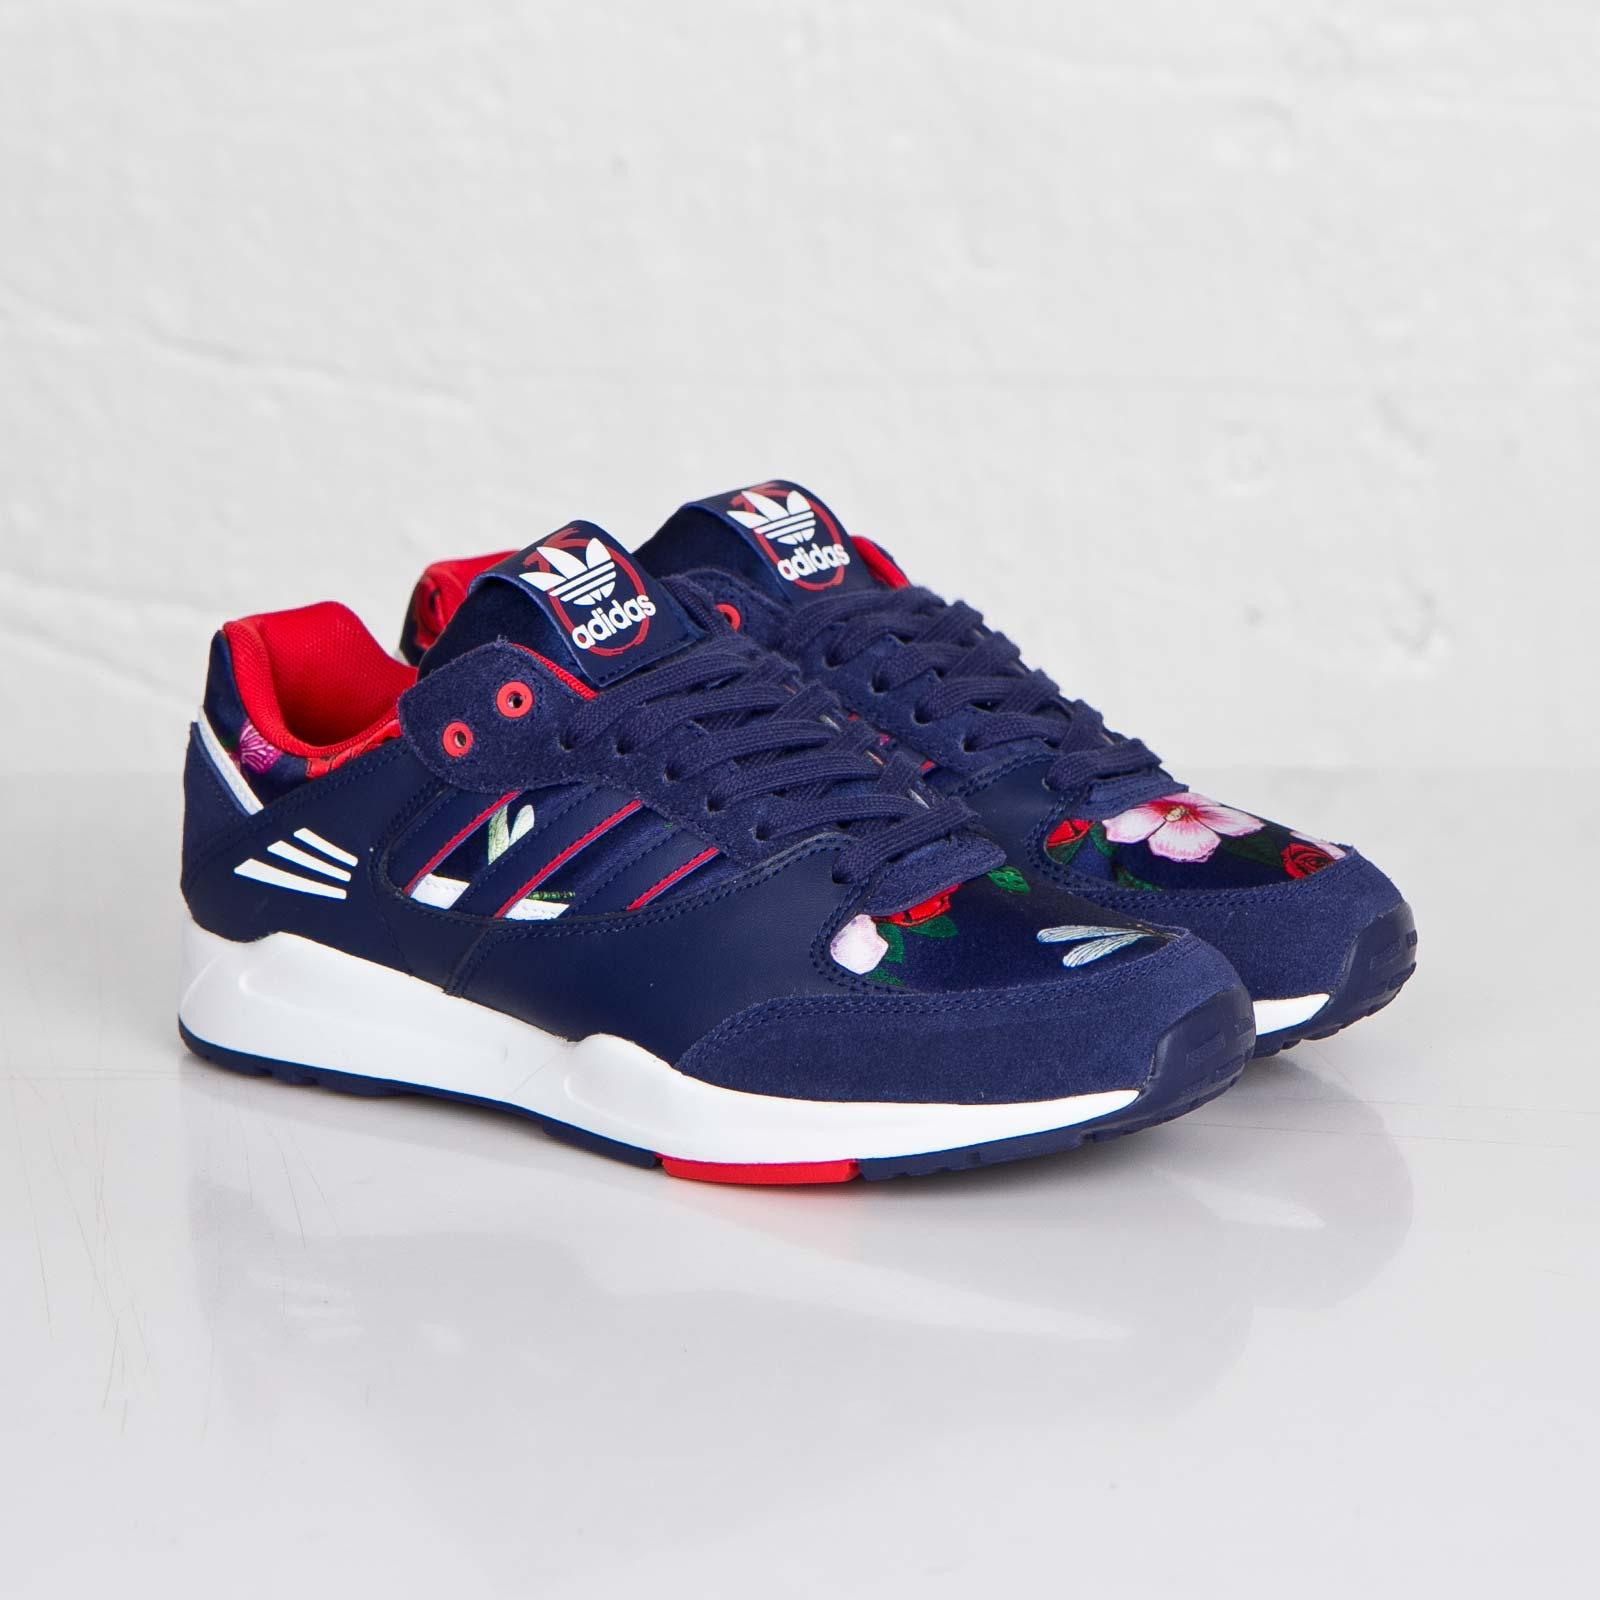 adidas Tech Super W M19076 Sneakersnstuff I Sneakers